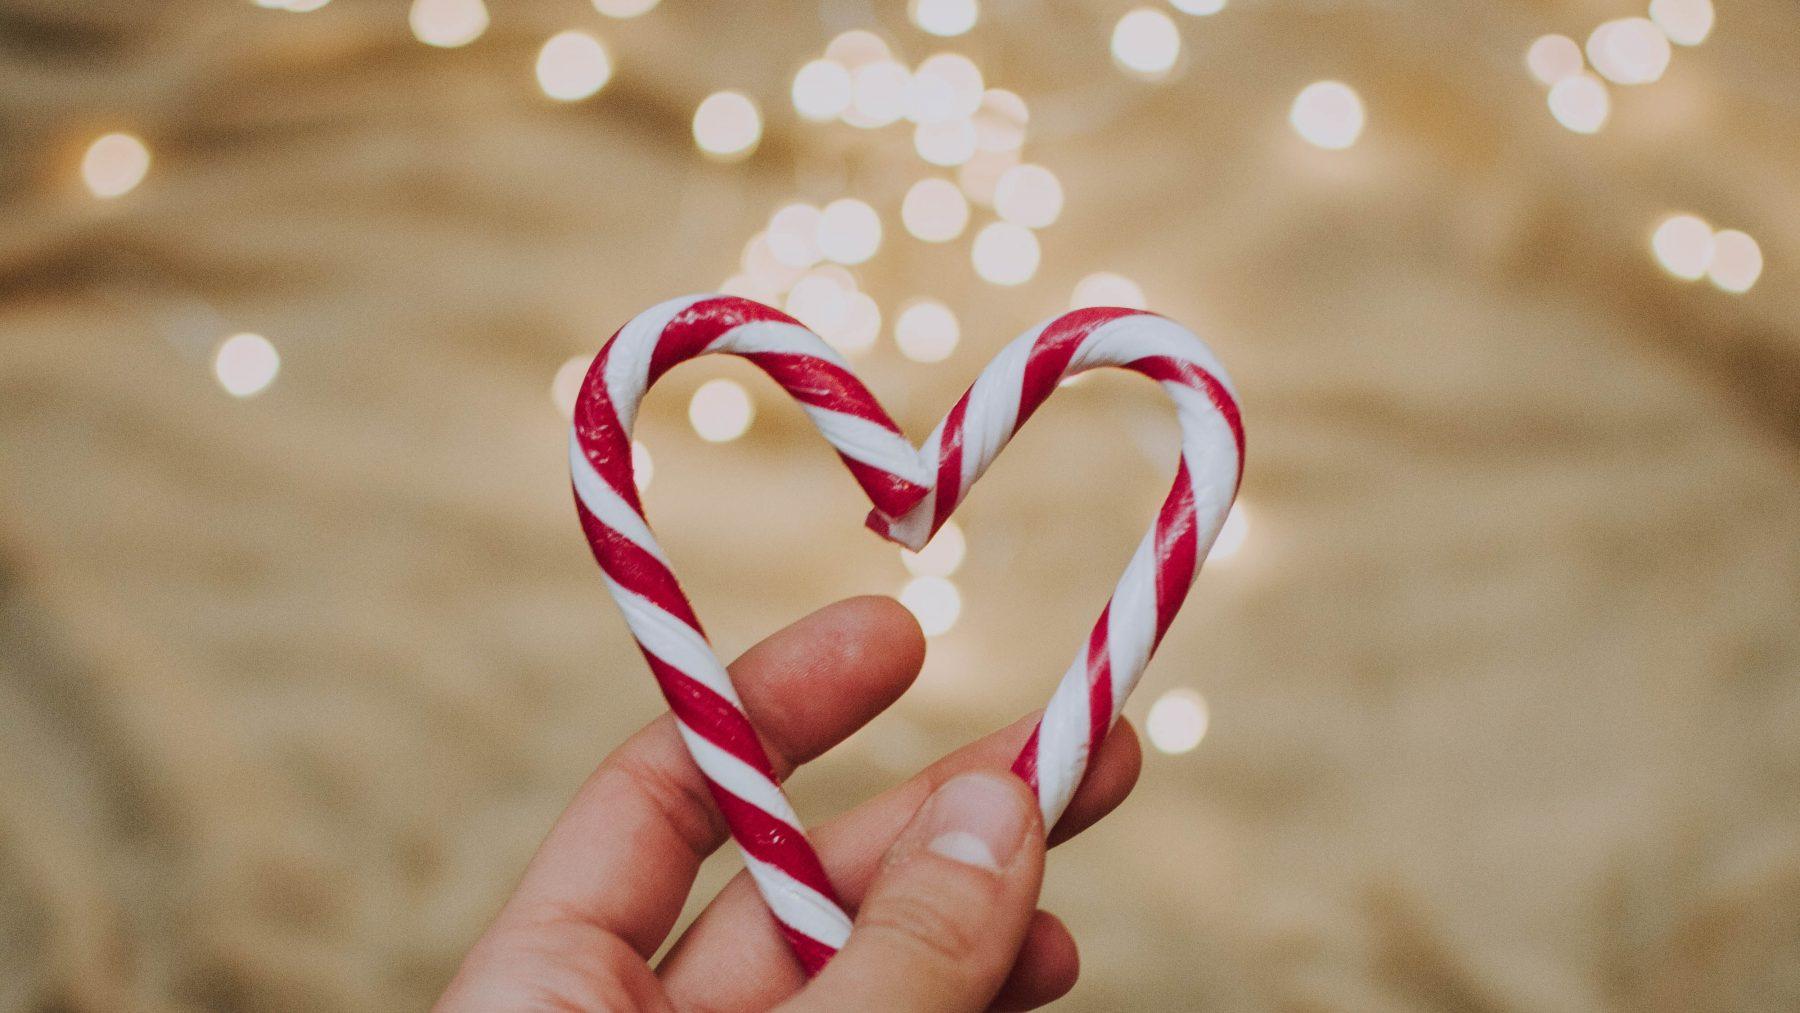 kerstfilm happiest season